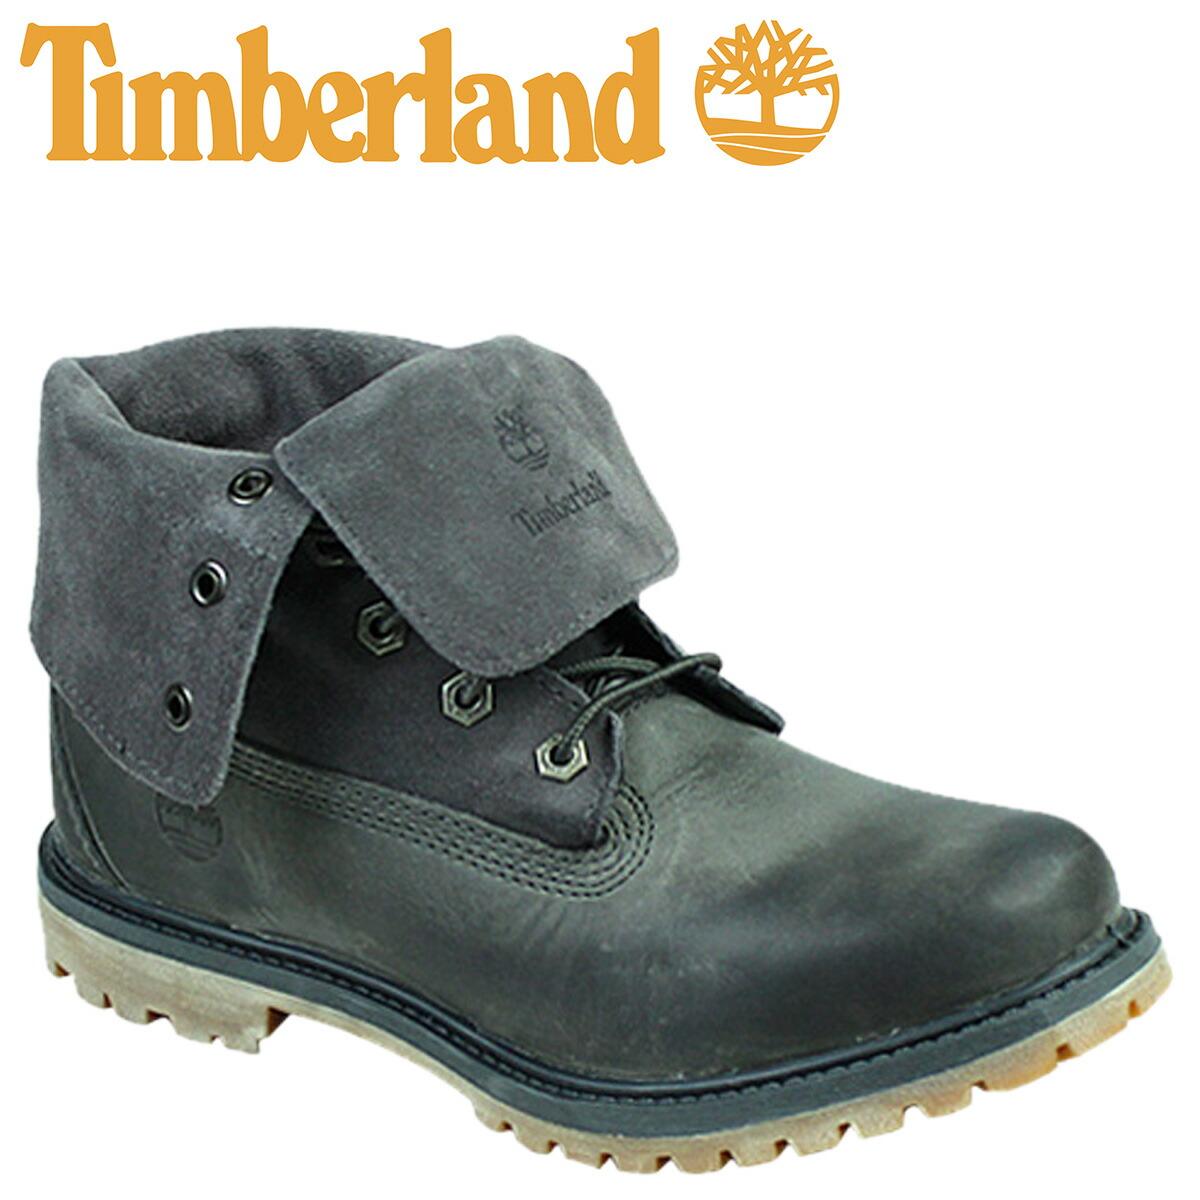 soldes yves saint laurent - SneaK Online Shop | Rakuten Global Market: Timberland Timberland ...